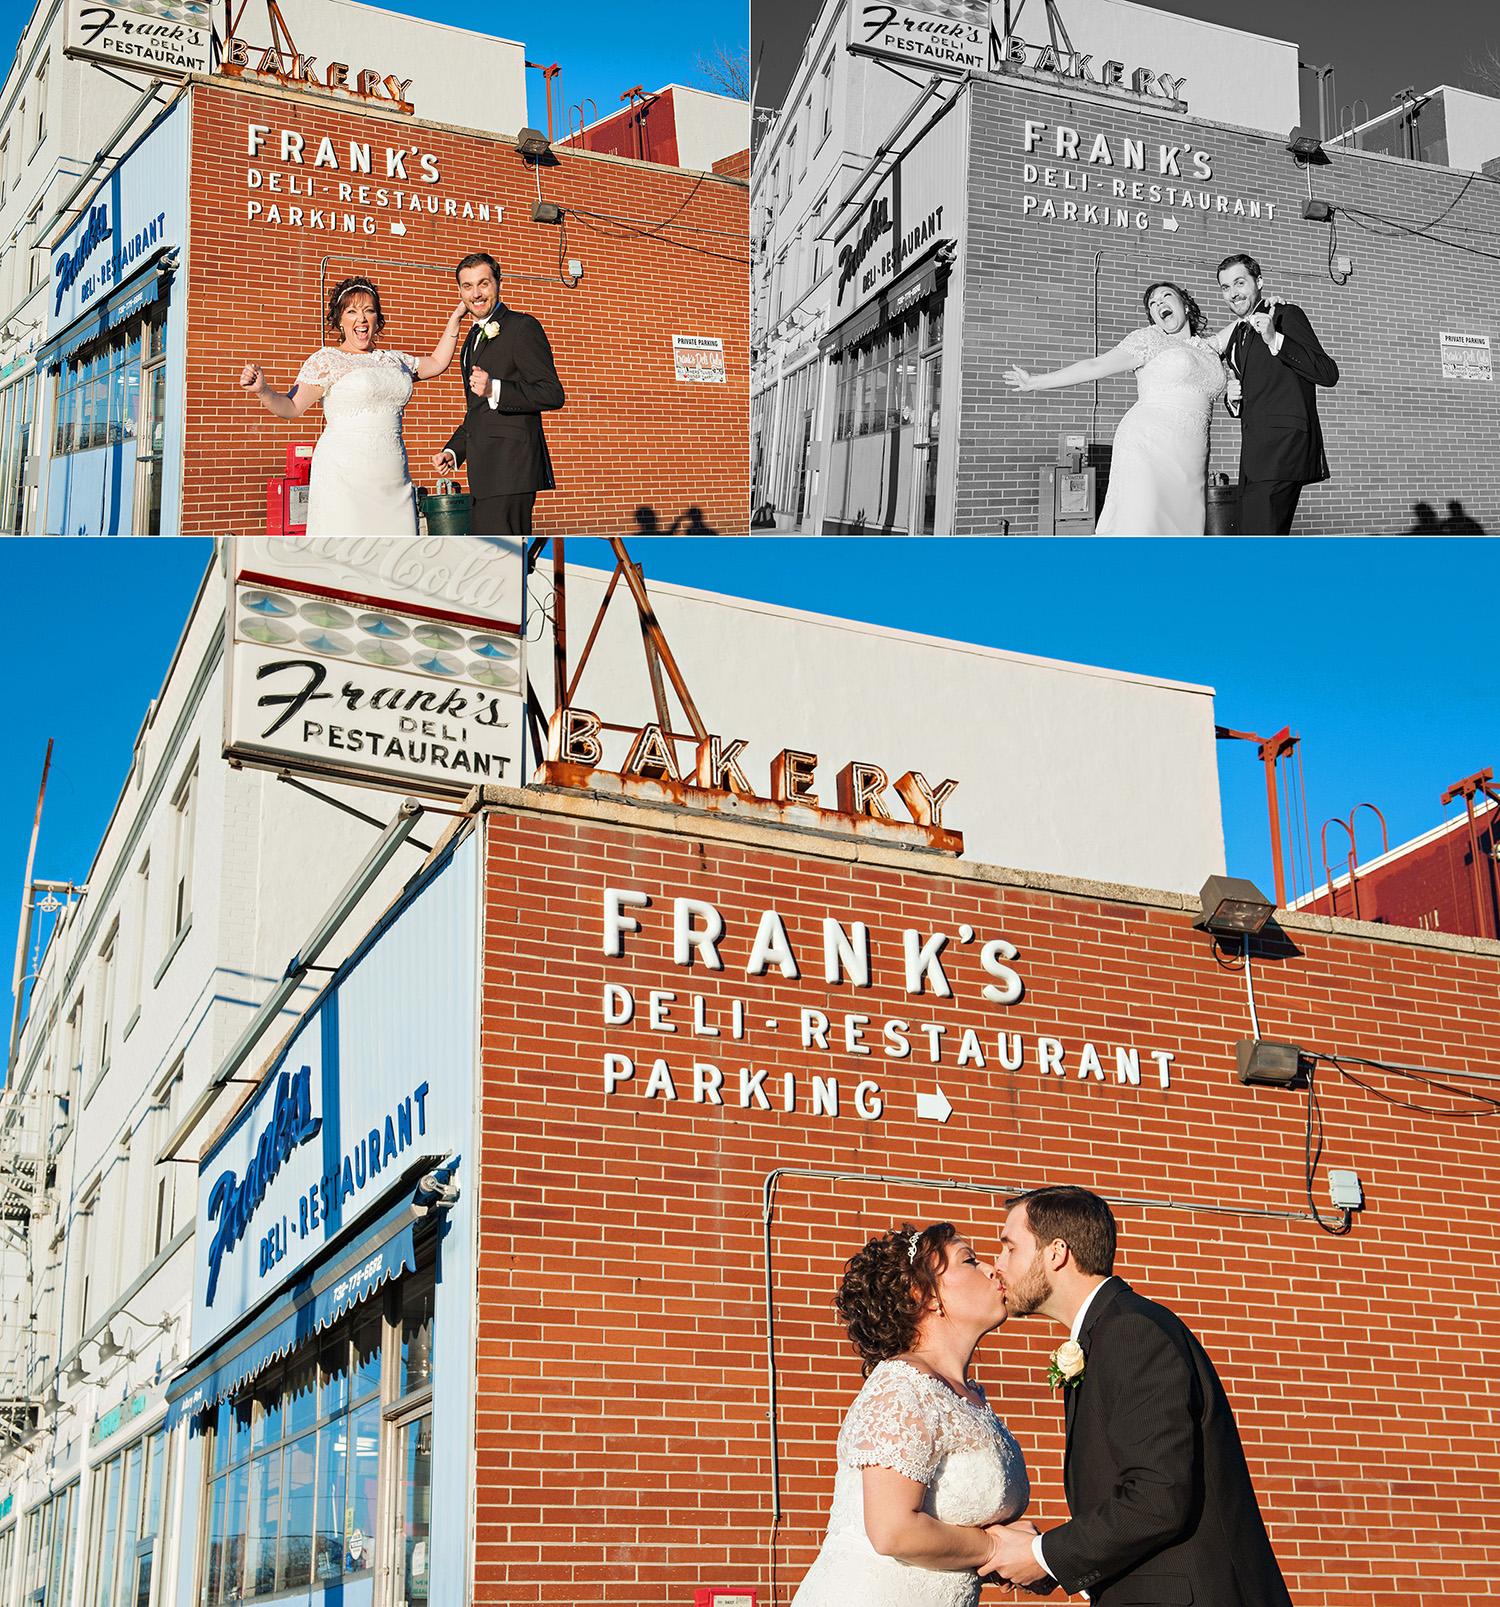 10_SRS_Photography_Sara_Stadtmiller_Asbury_Park_Wedding_Photography_NJ_Wedding_Photographer_Monmouth_County_Wedding_Photographer_Home_Wedding_DIY_Wedding_Franks_Deli